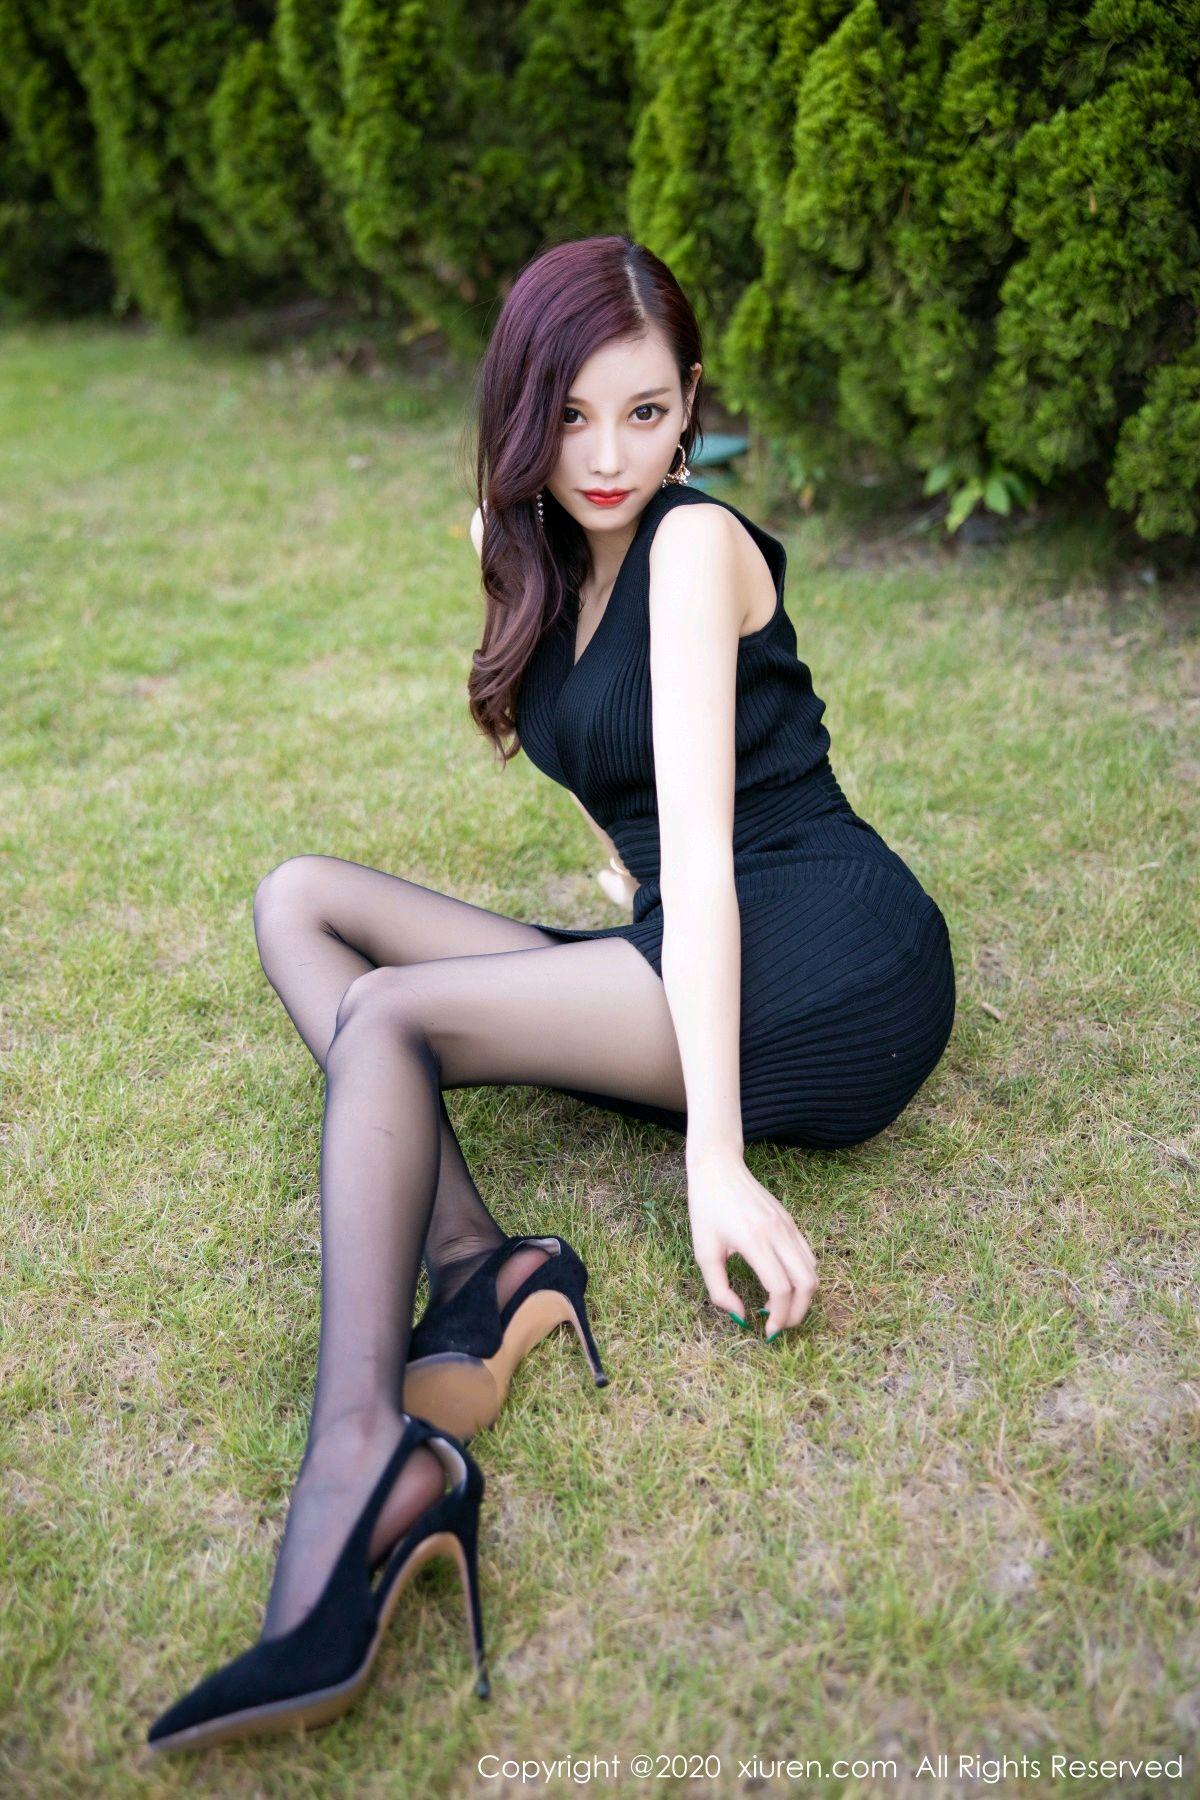 [XiuRen] Vol.2648 Yang Chen Chen 25P, Black Silk, Outdoor, Xiuren, Yang Chen Chen